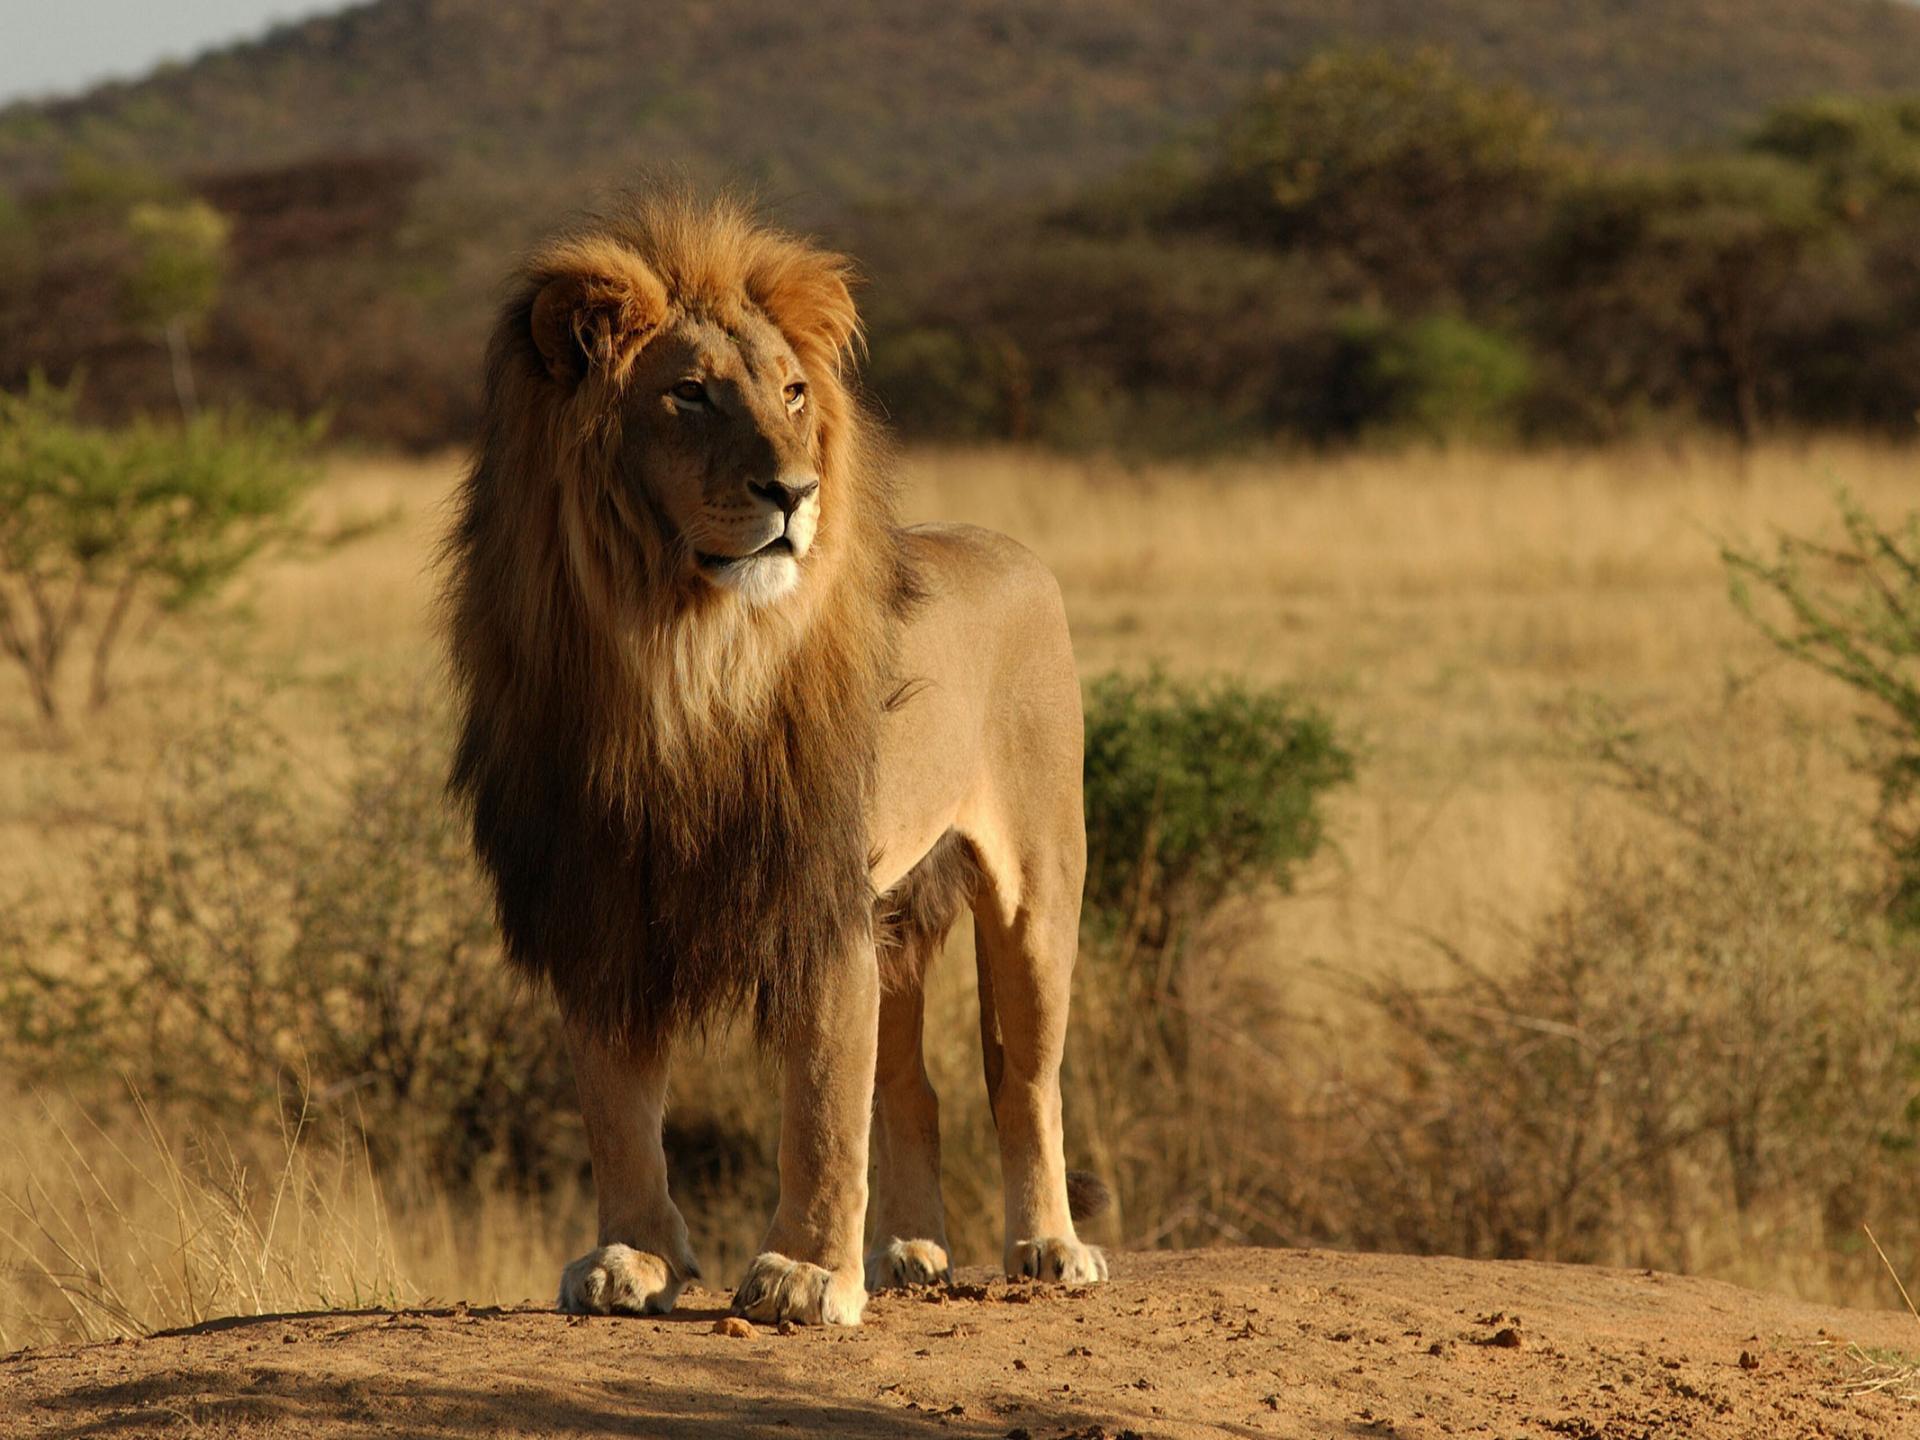 A Roaring Lion | normasnuggets